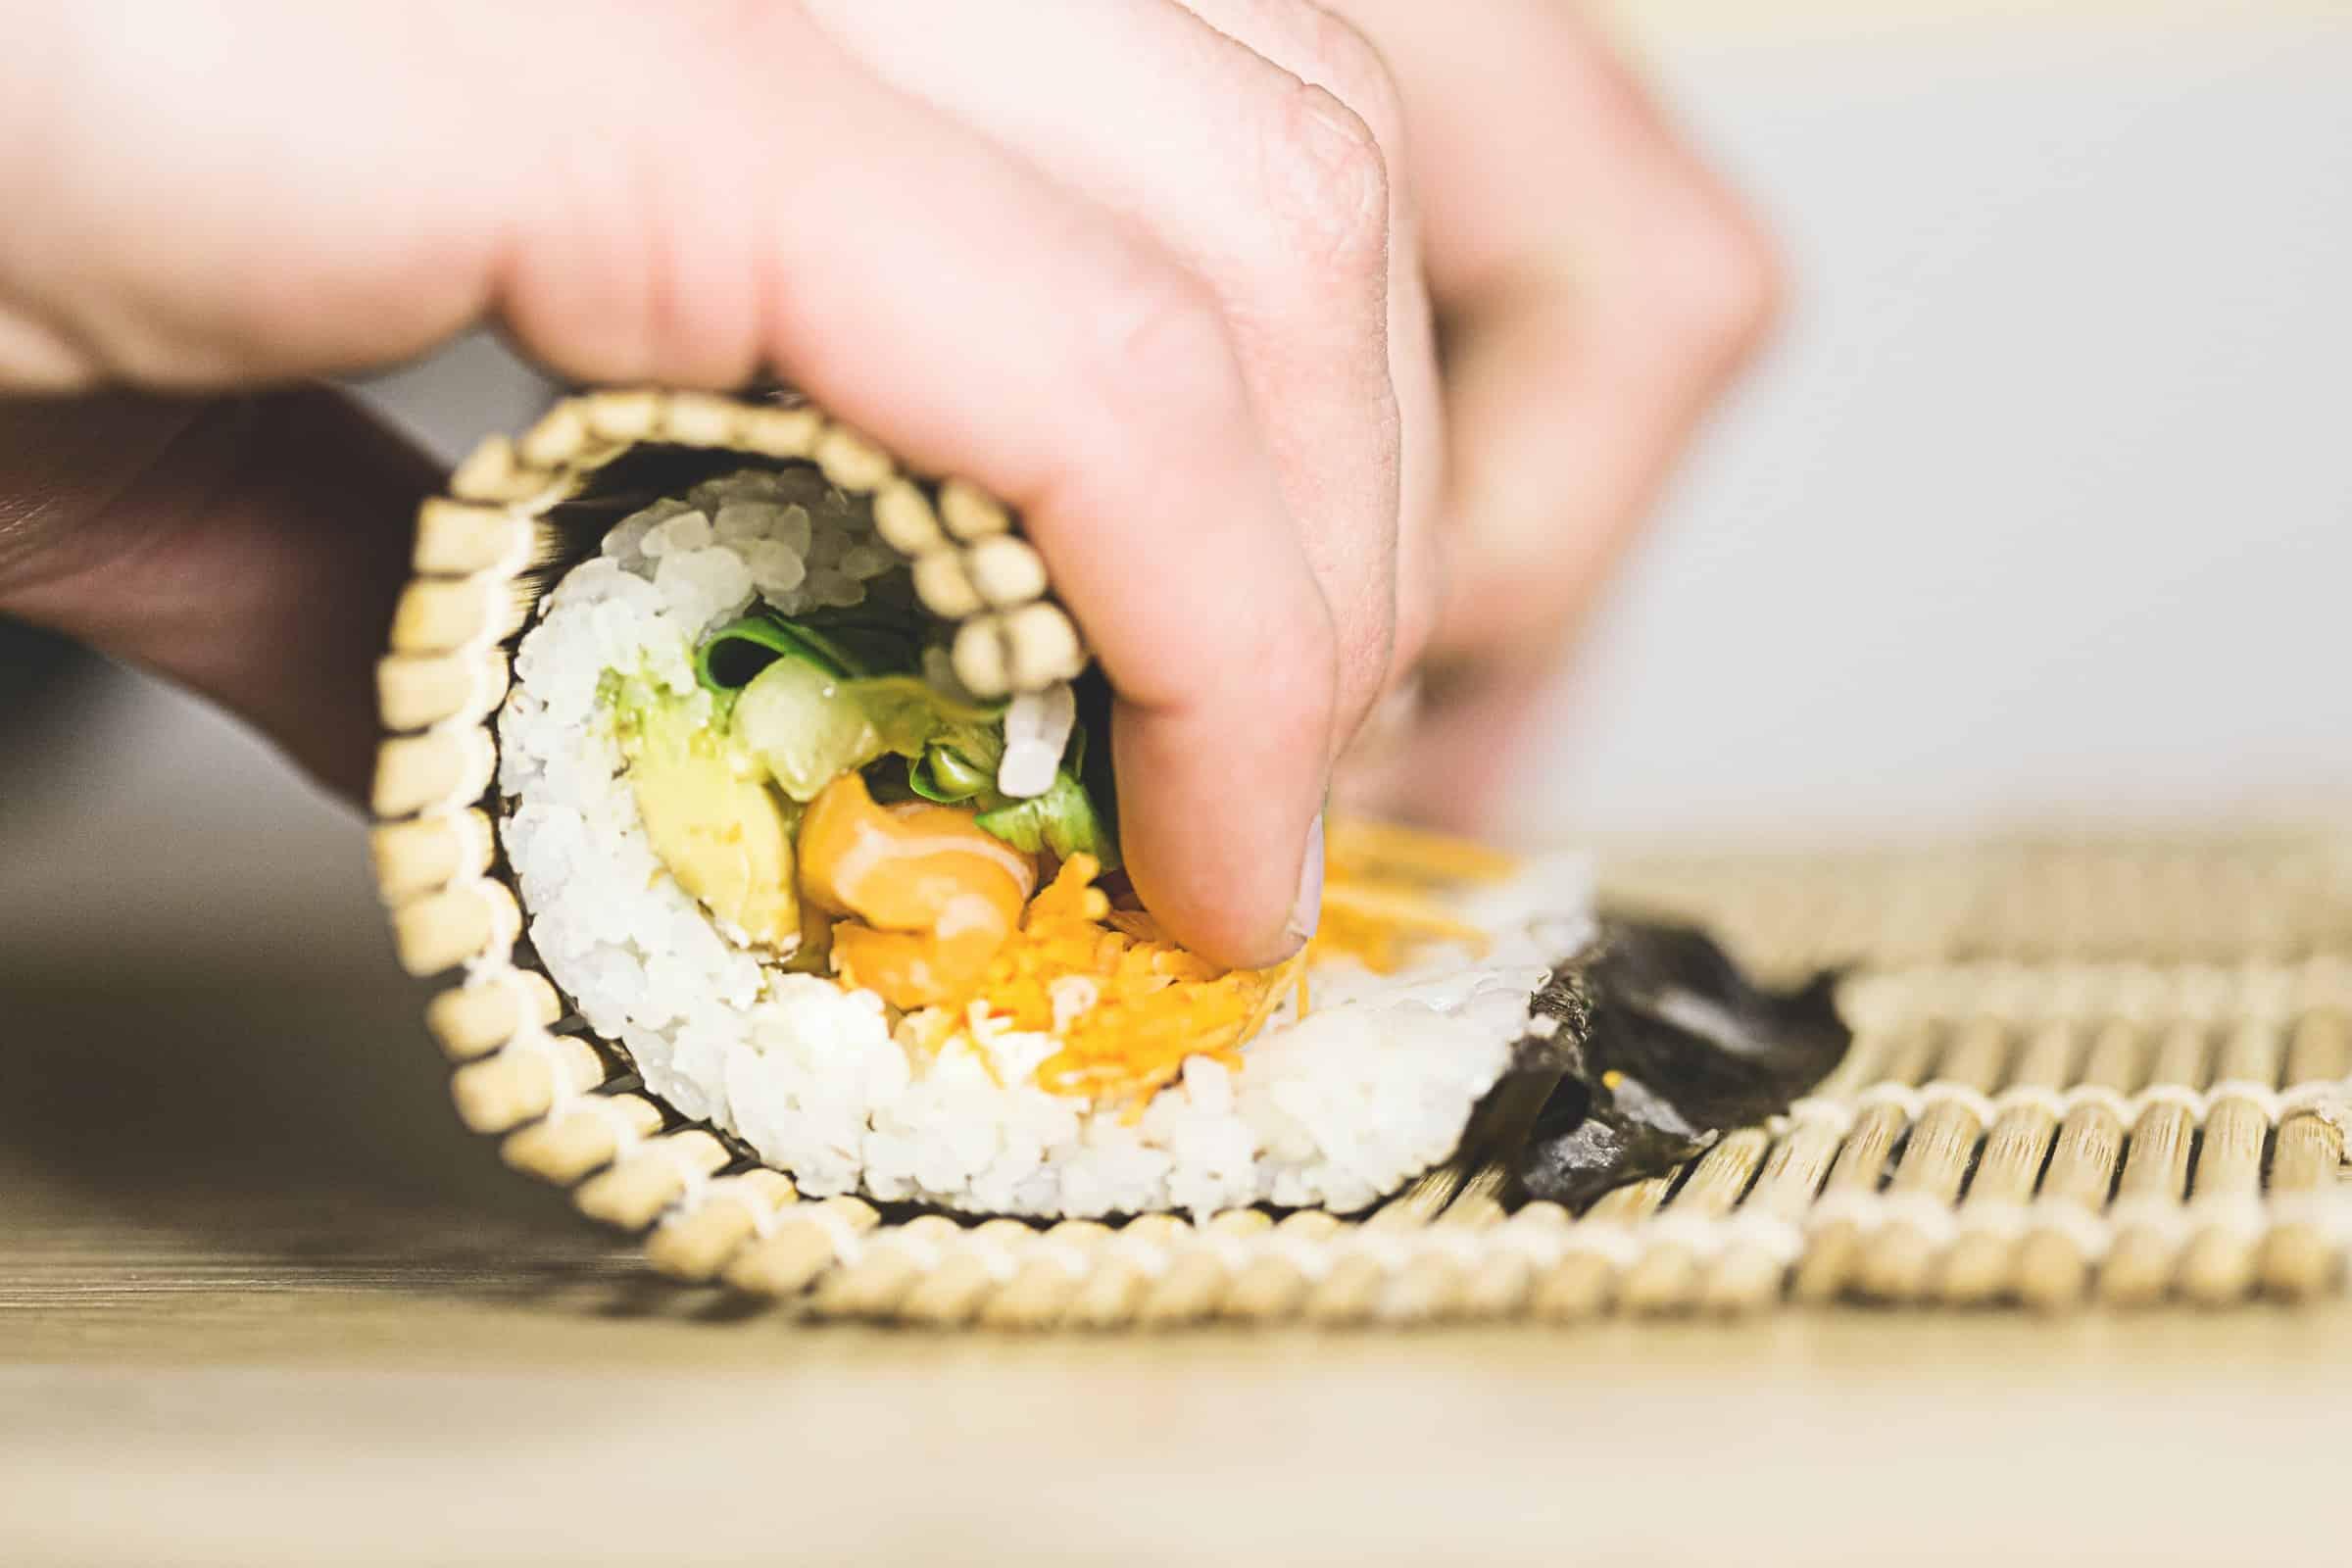 Sushi rijst koken? Perfecte sushi rijst koken doe je zo!